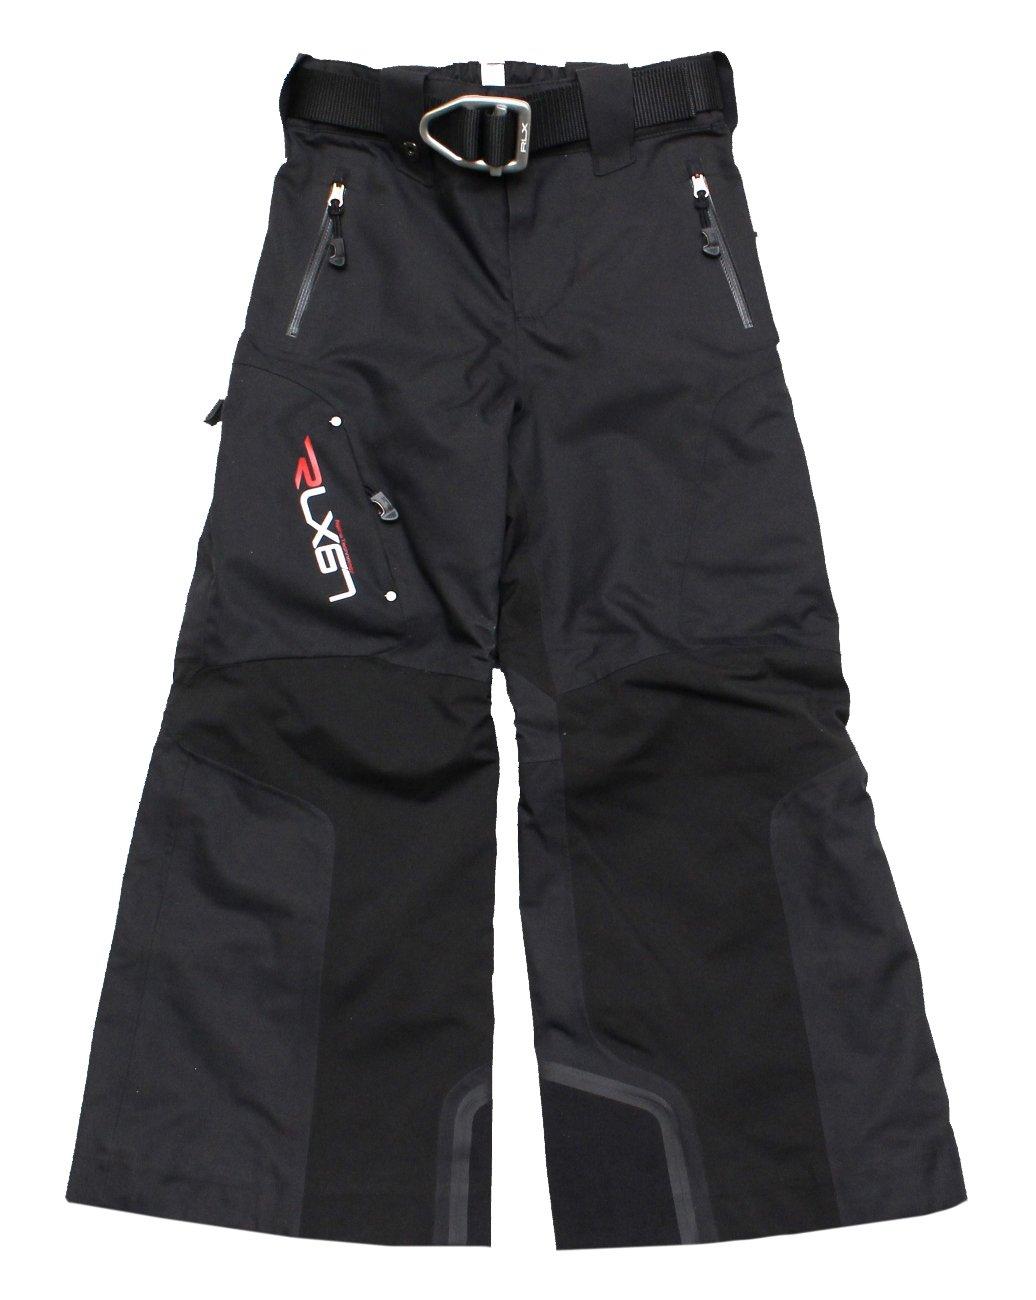 RLX Ralph Lauren Boys Ski Snow Pants, Black (Size 5)